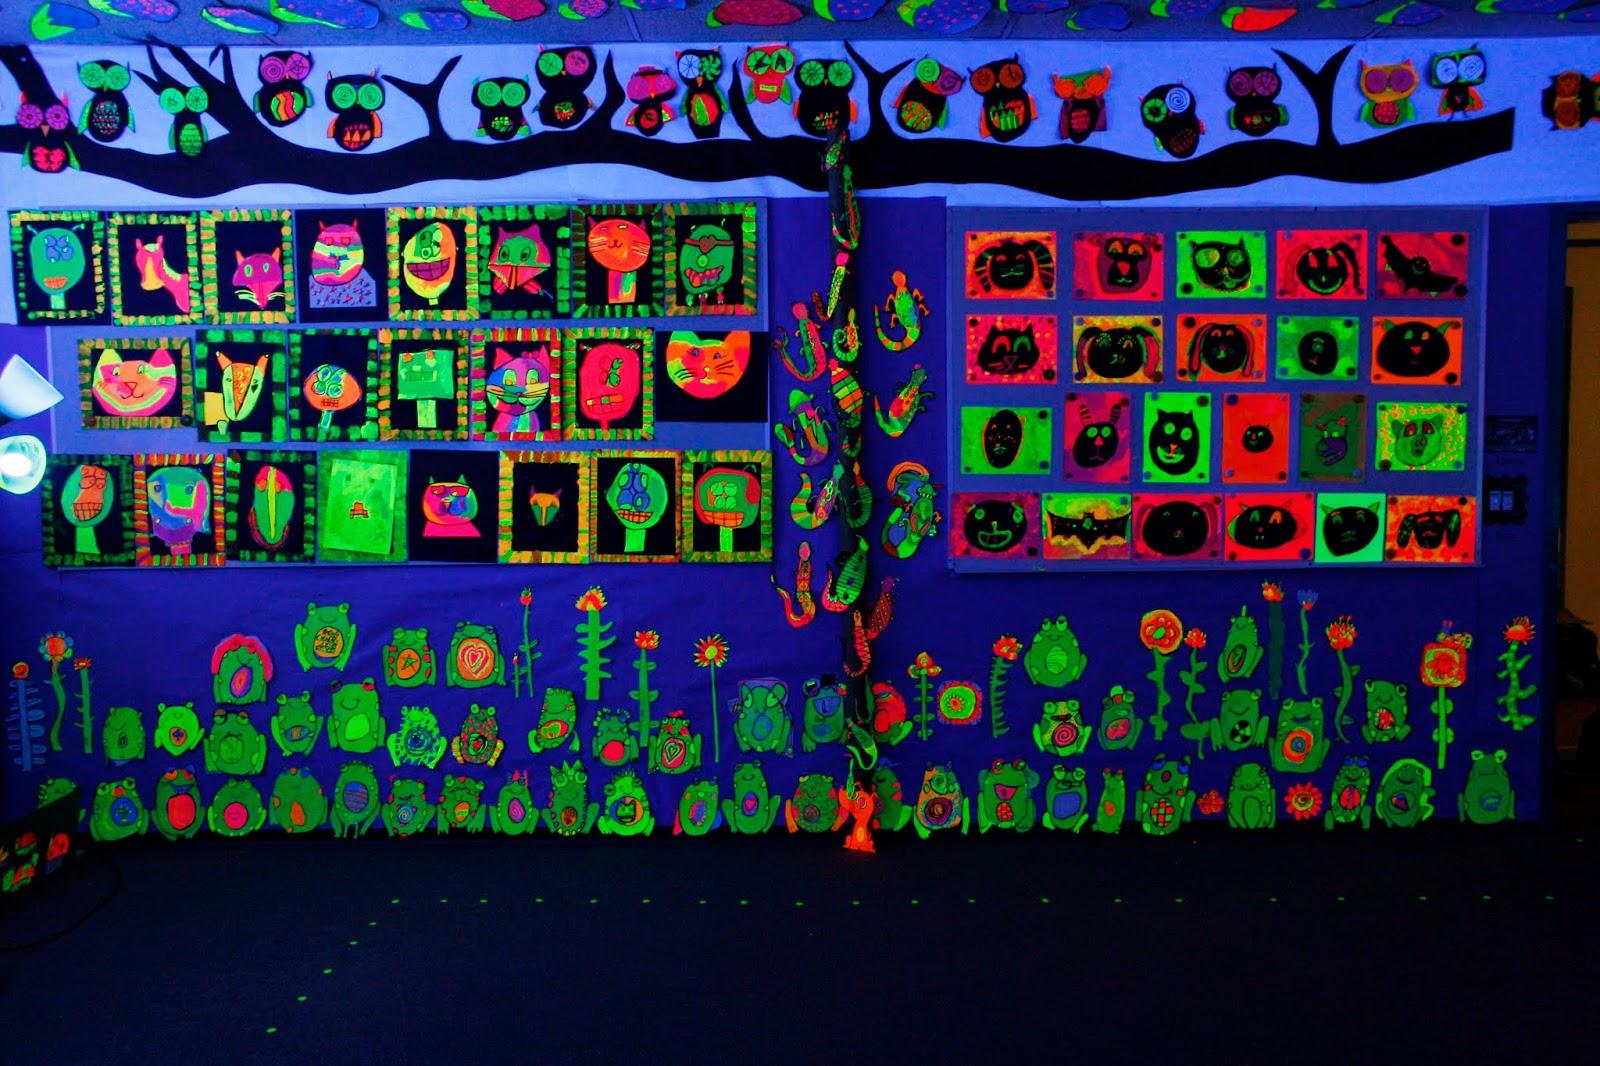 Black Light Art Show